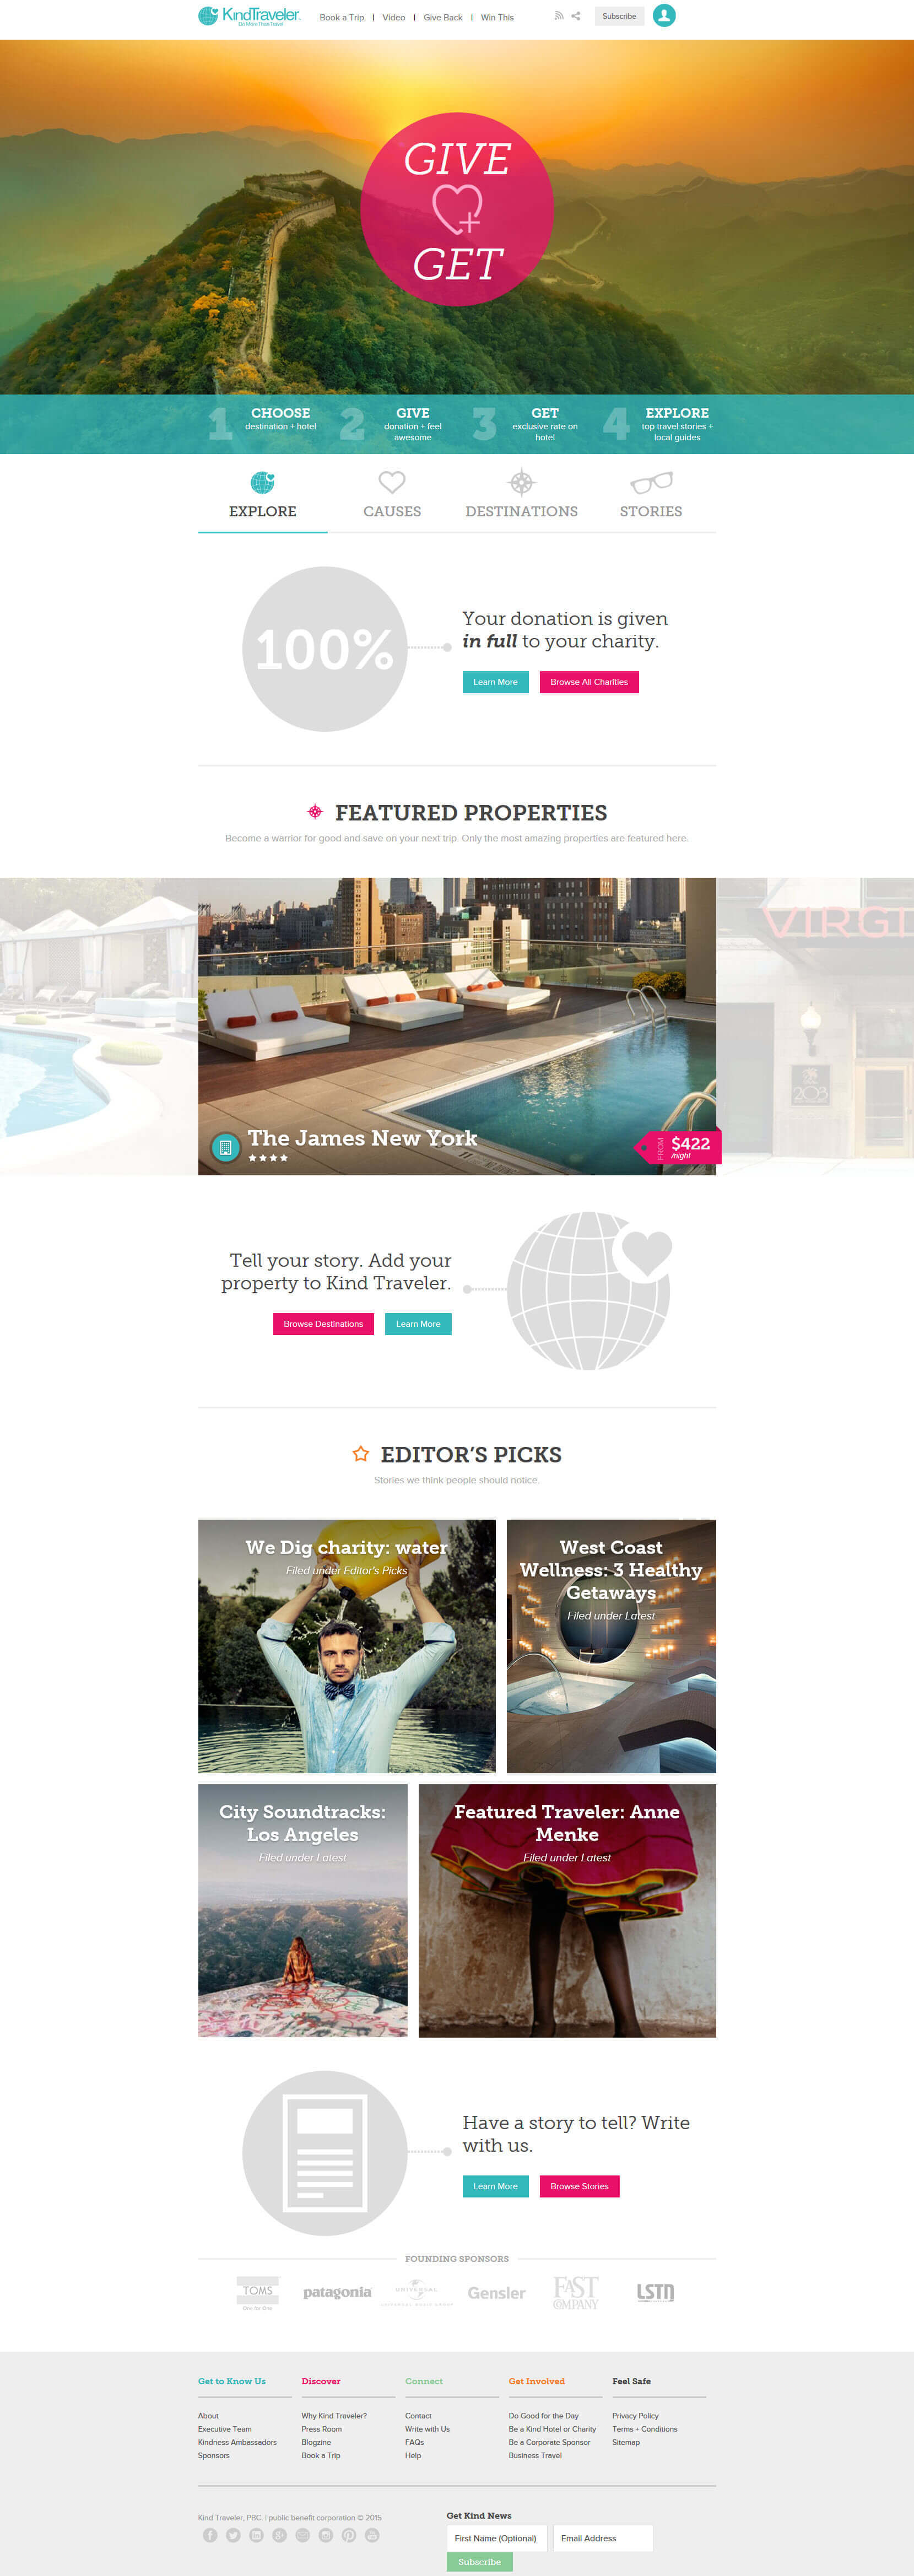 Kind Traveler Travel Booking Online Site